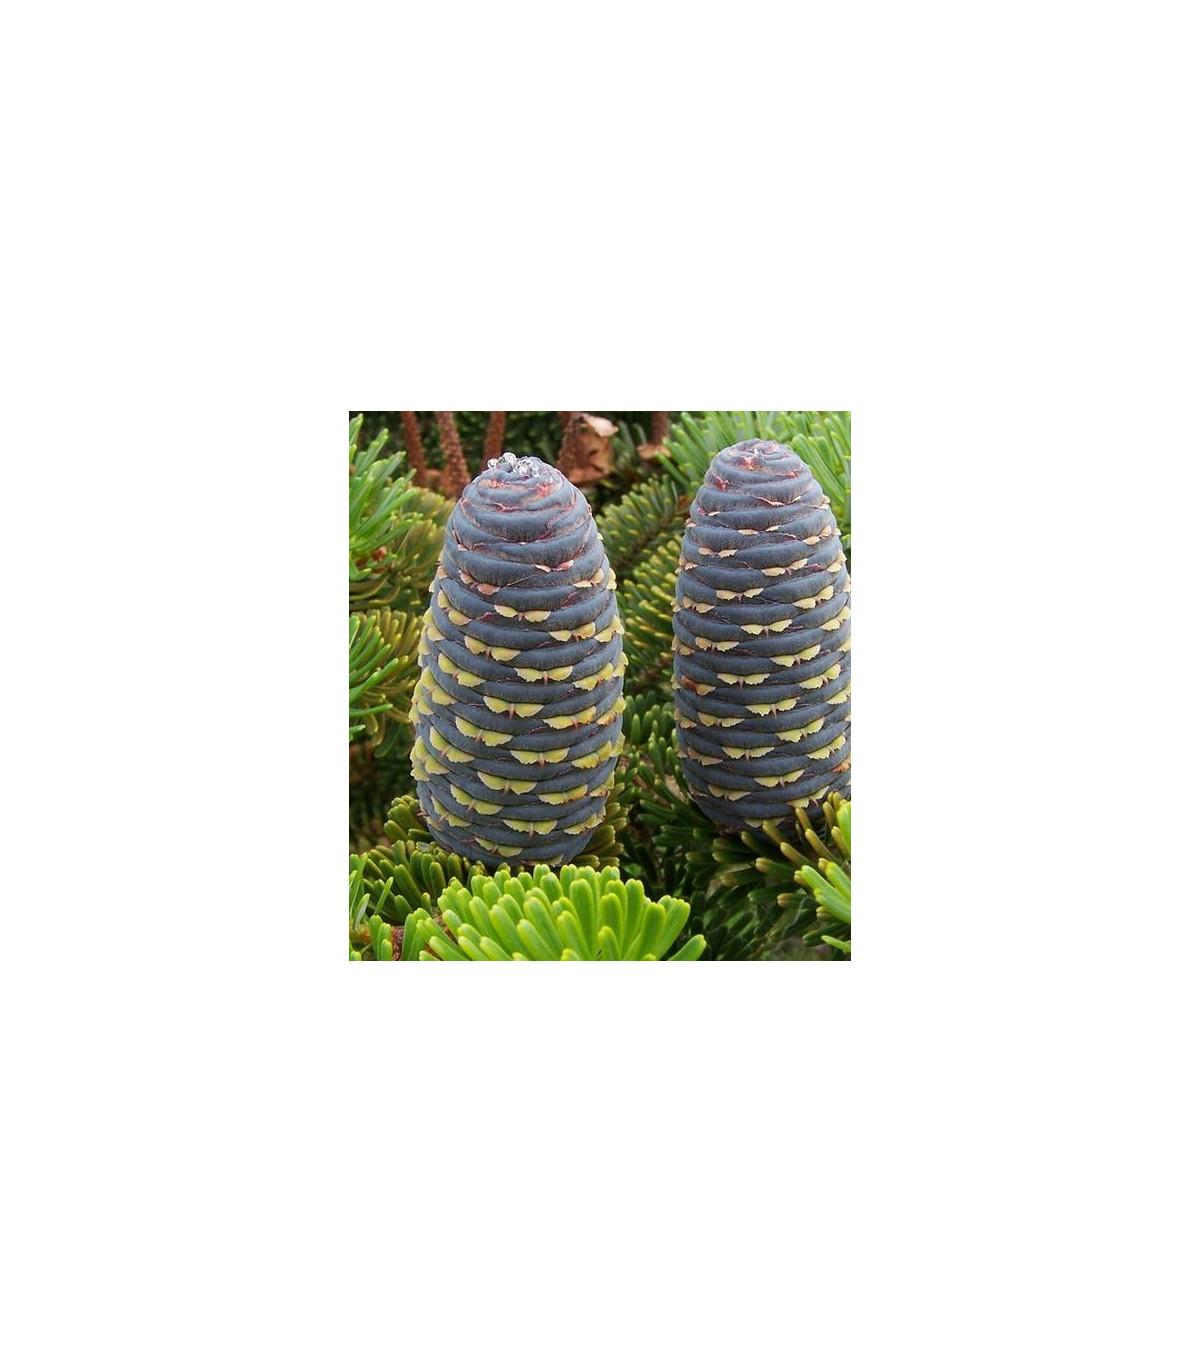 Jedle Faberova- Abies fabri- semena jedle- 7 ks